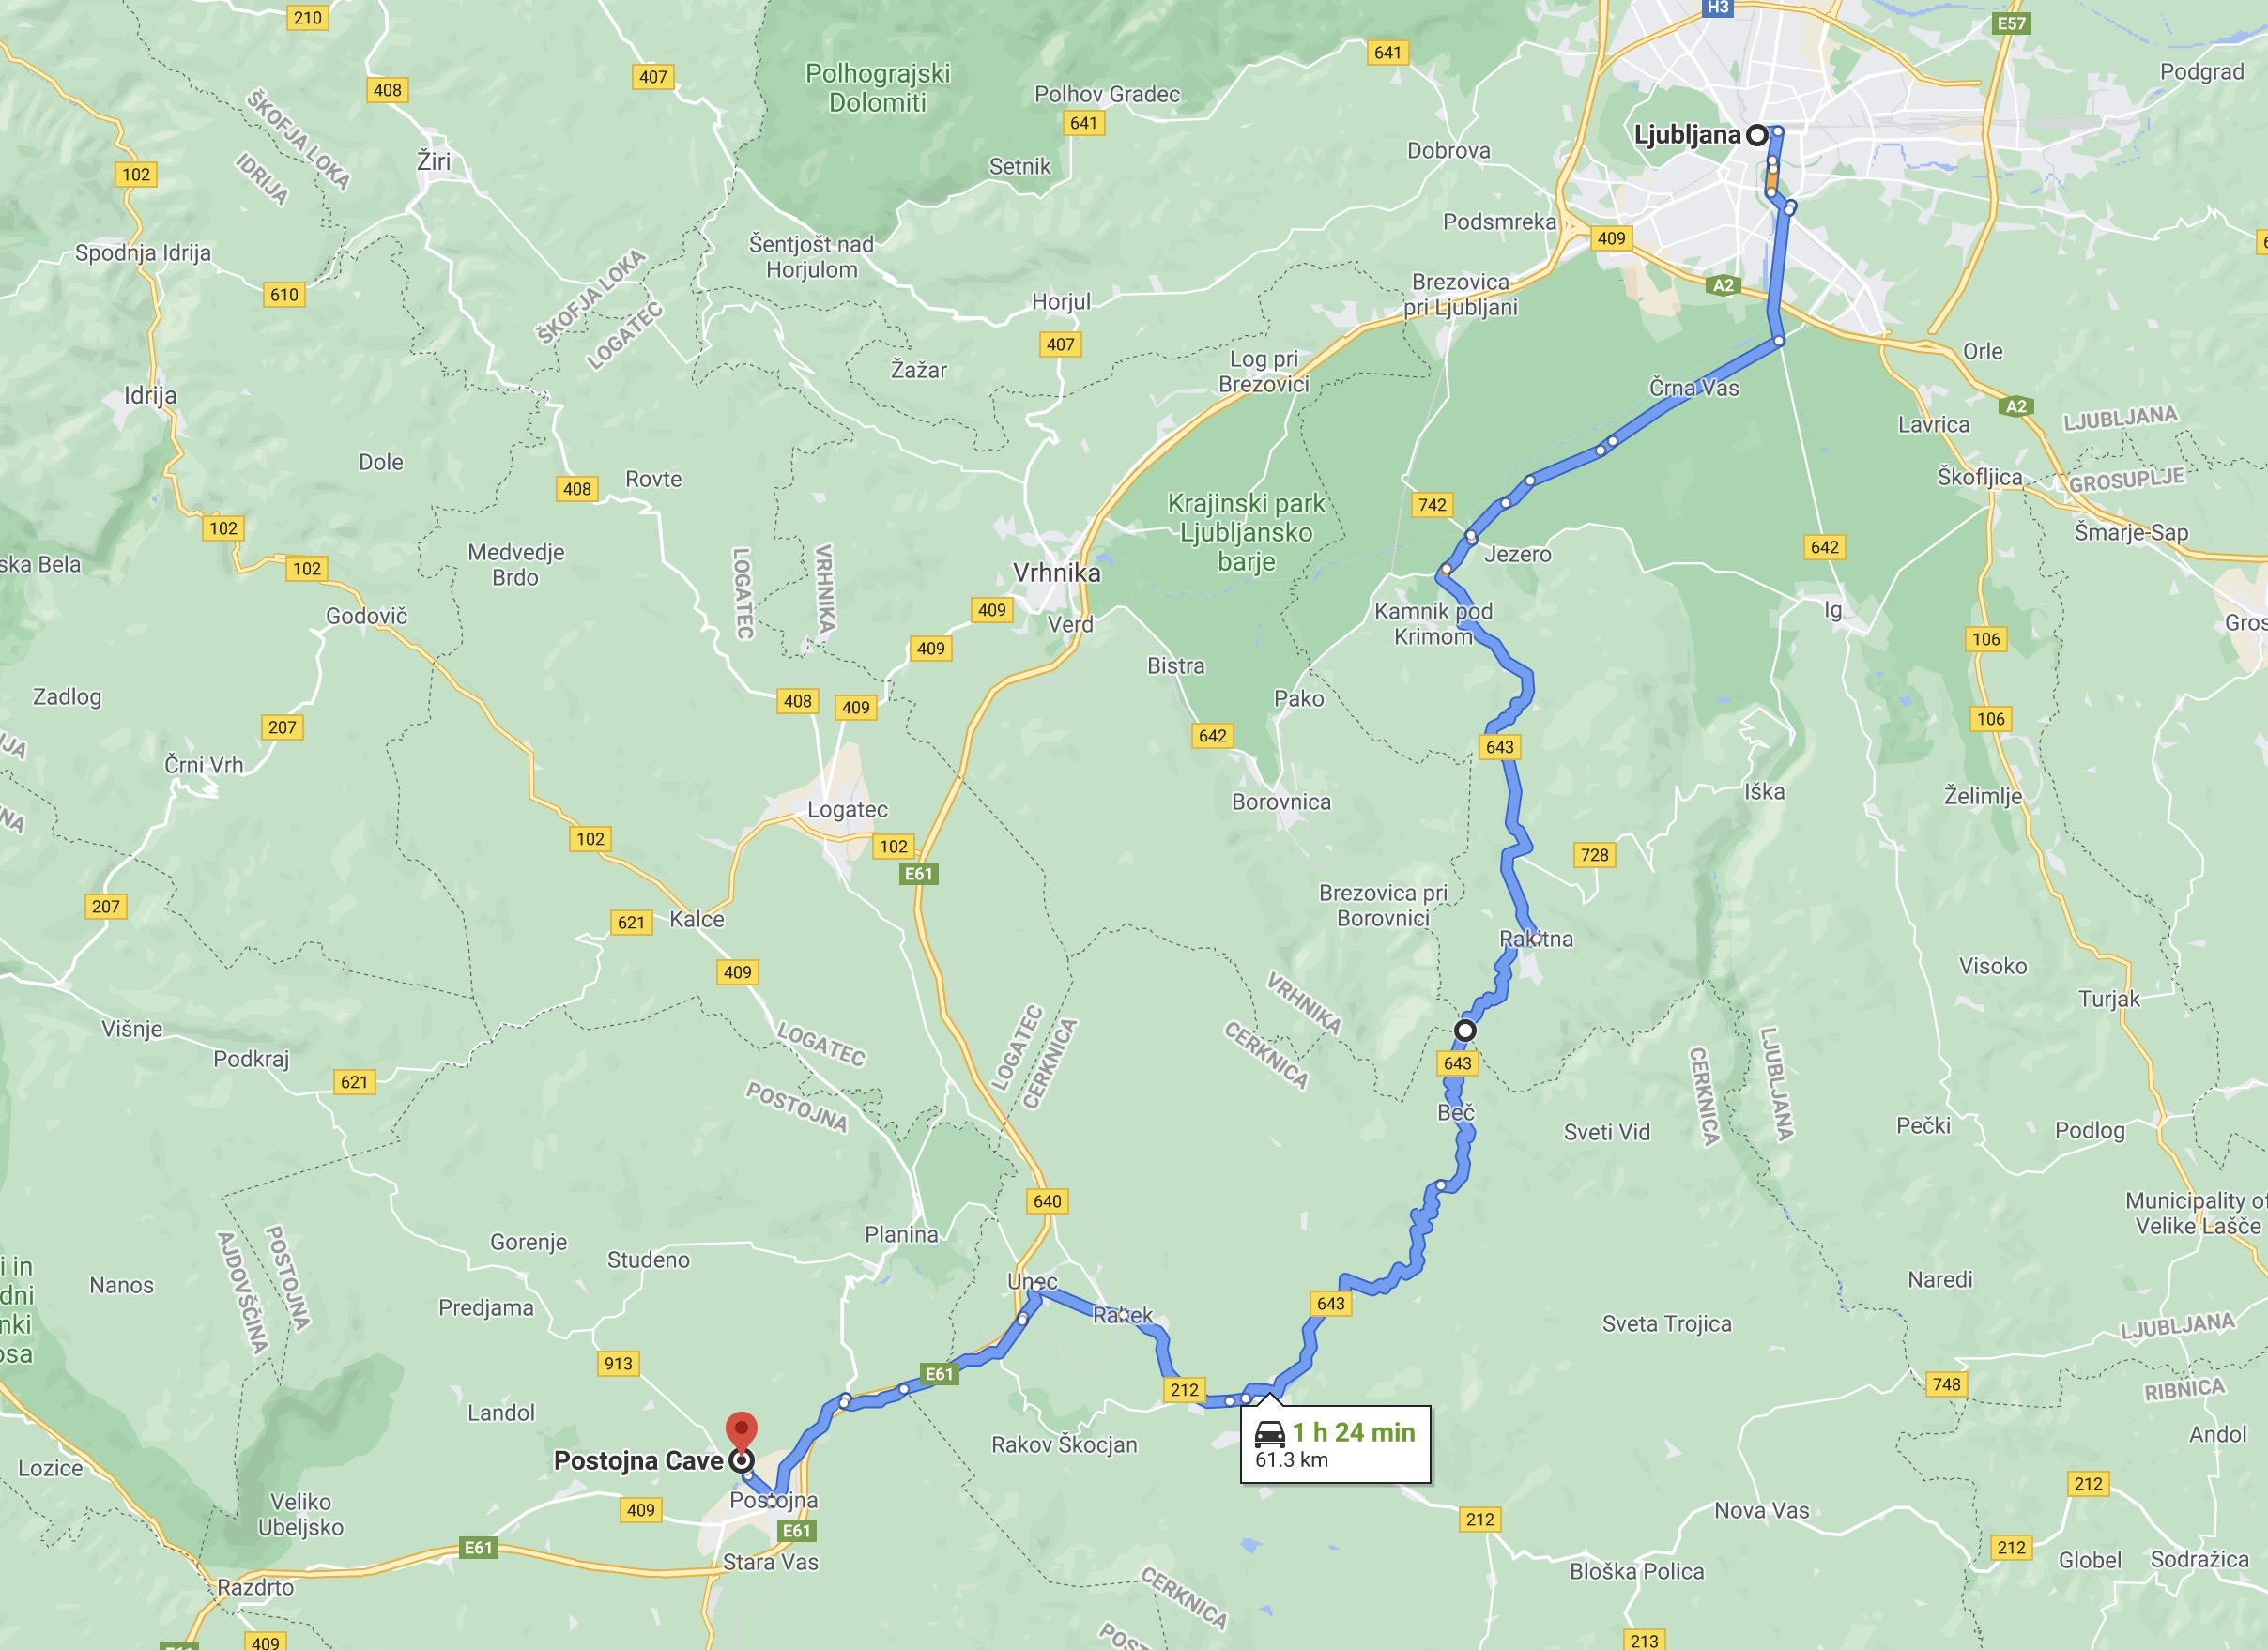 Ljubljana To Postojna Route